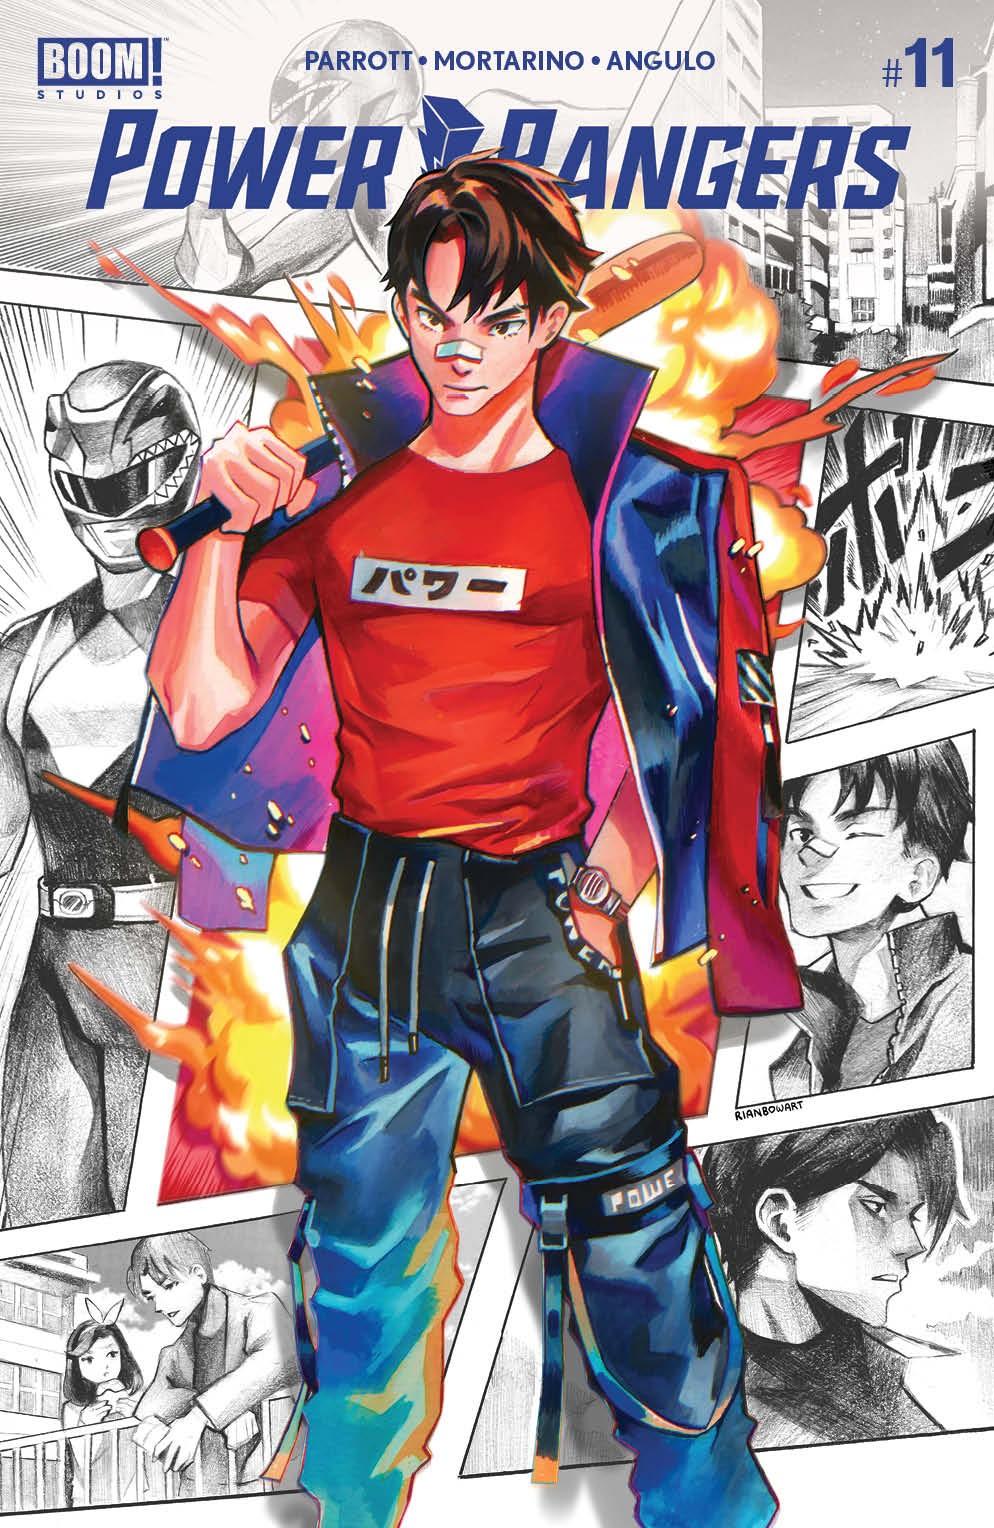 PowerRangers_011_Cover_E_Variant ComicList Previews: POWER RANGERS #11